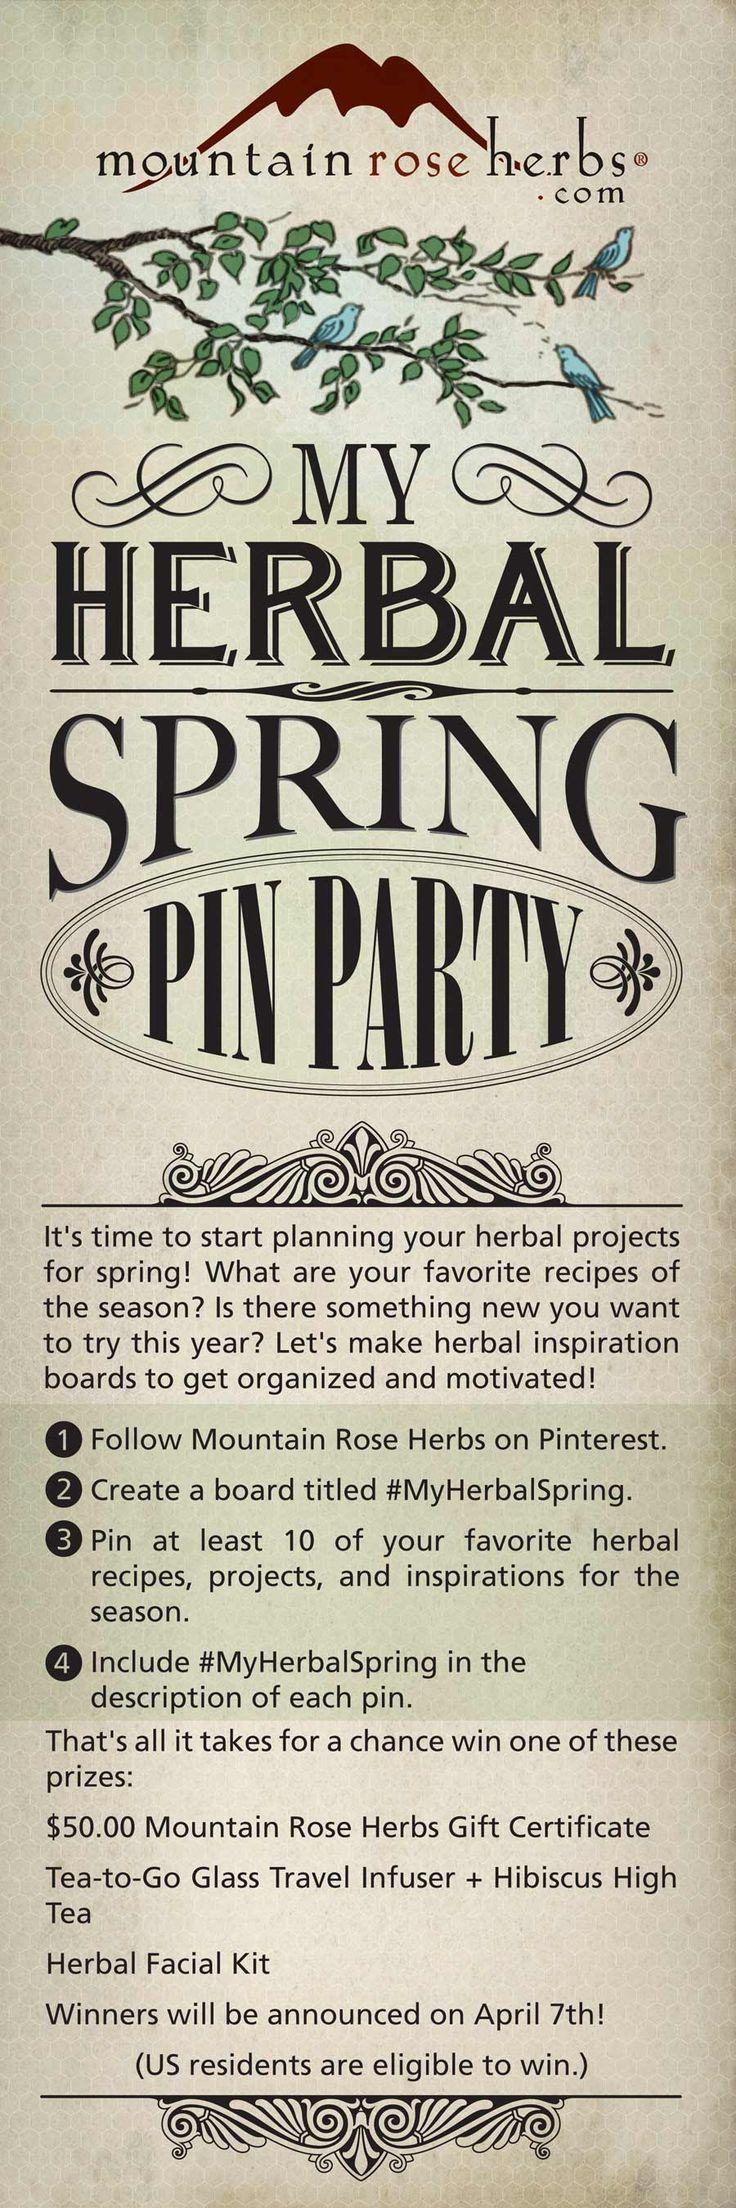 #MyHerbalSpring Pin Party at Mountain Rose Herbs!